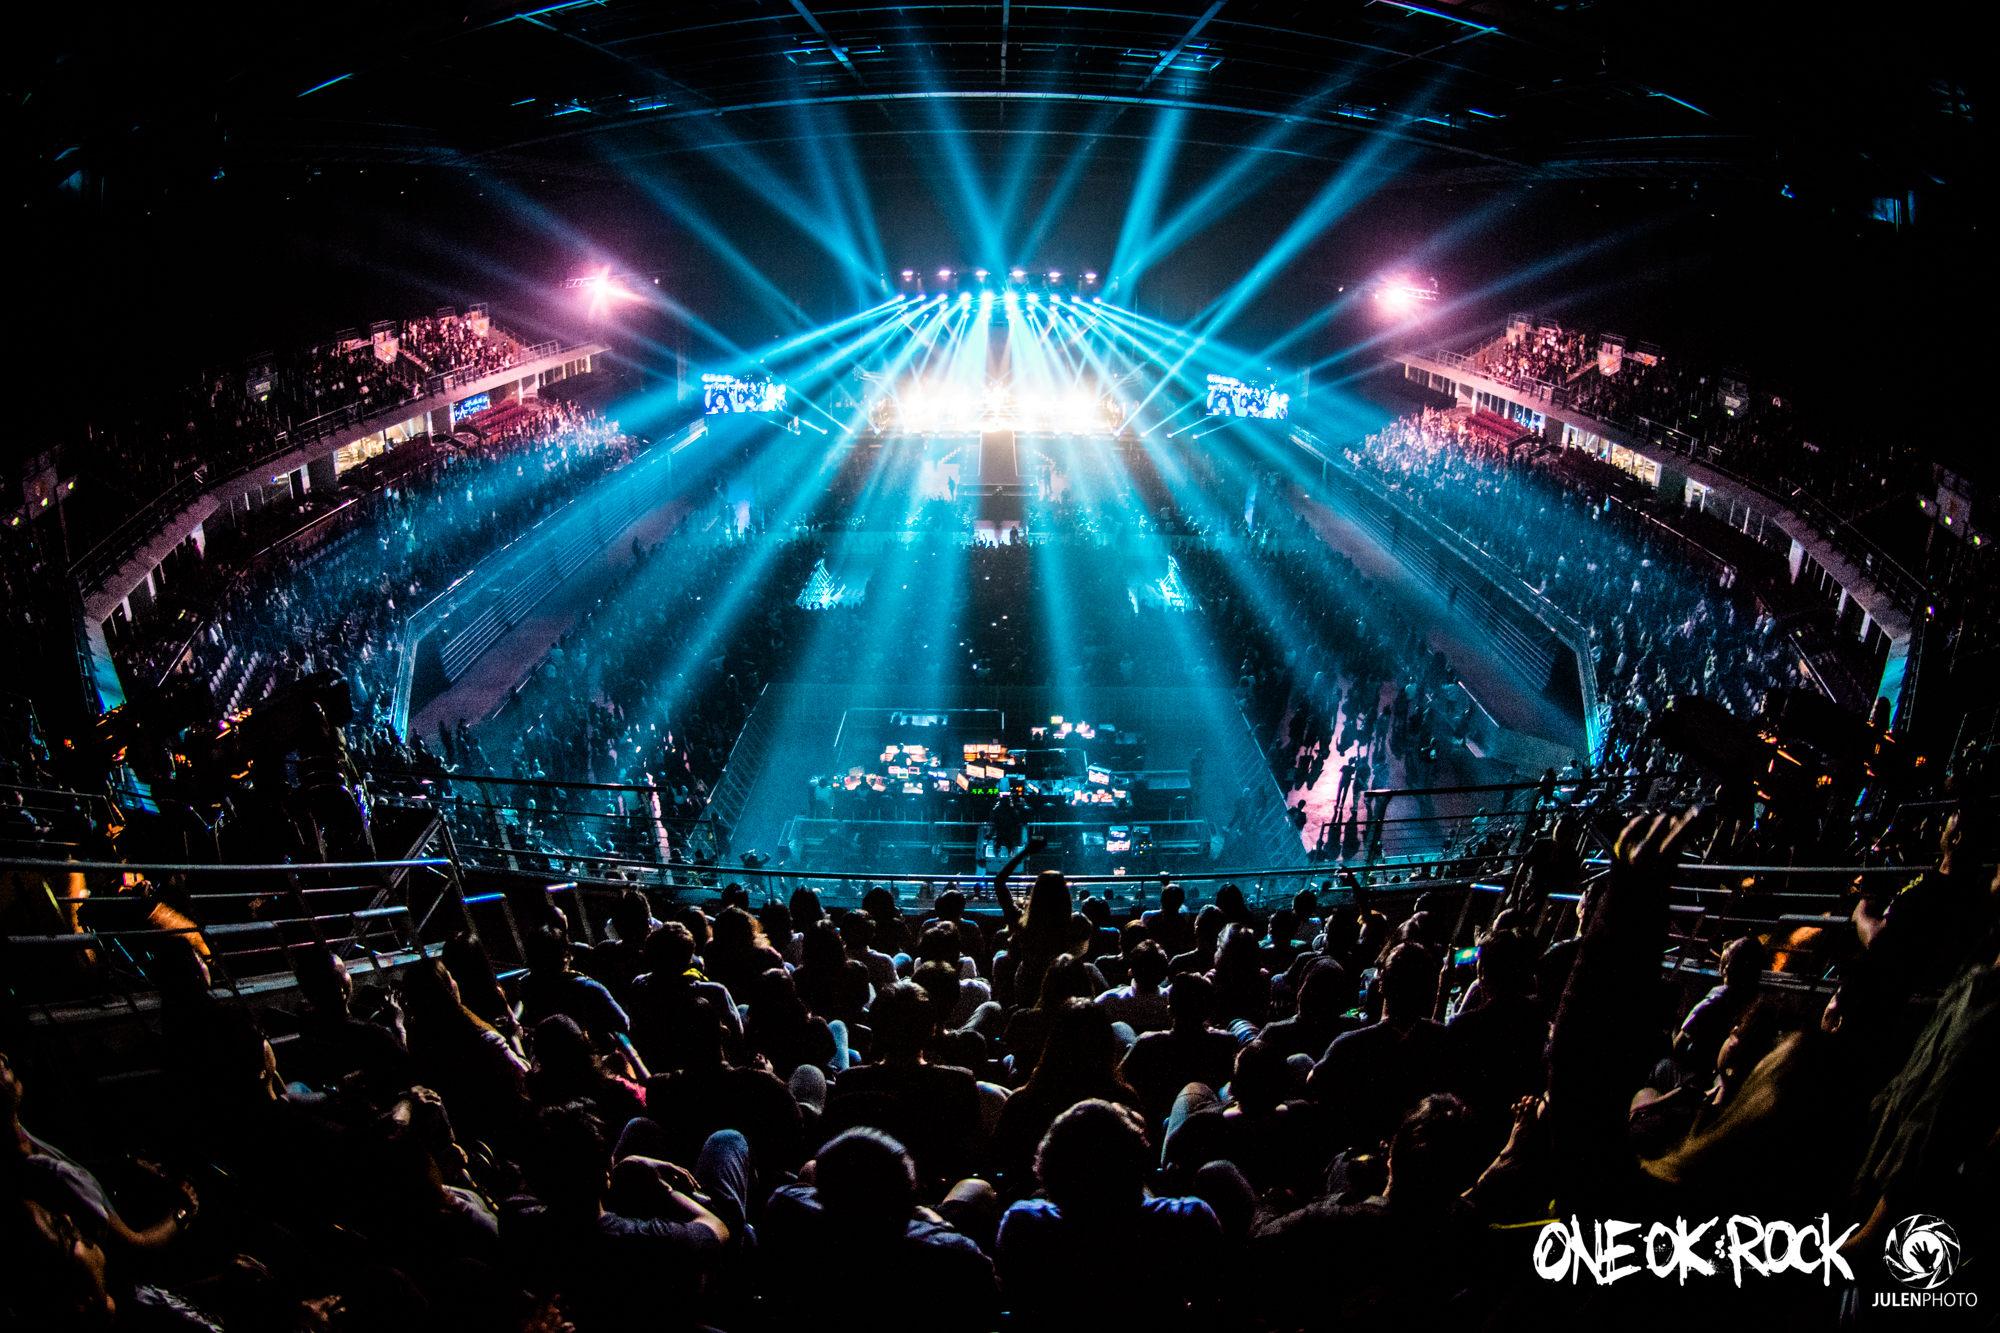 ONE-OK-ROCK-180118-Asia-Tour-Bangkok-Behind-Scenes-by-JulenPhoto-003